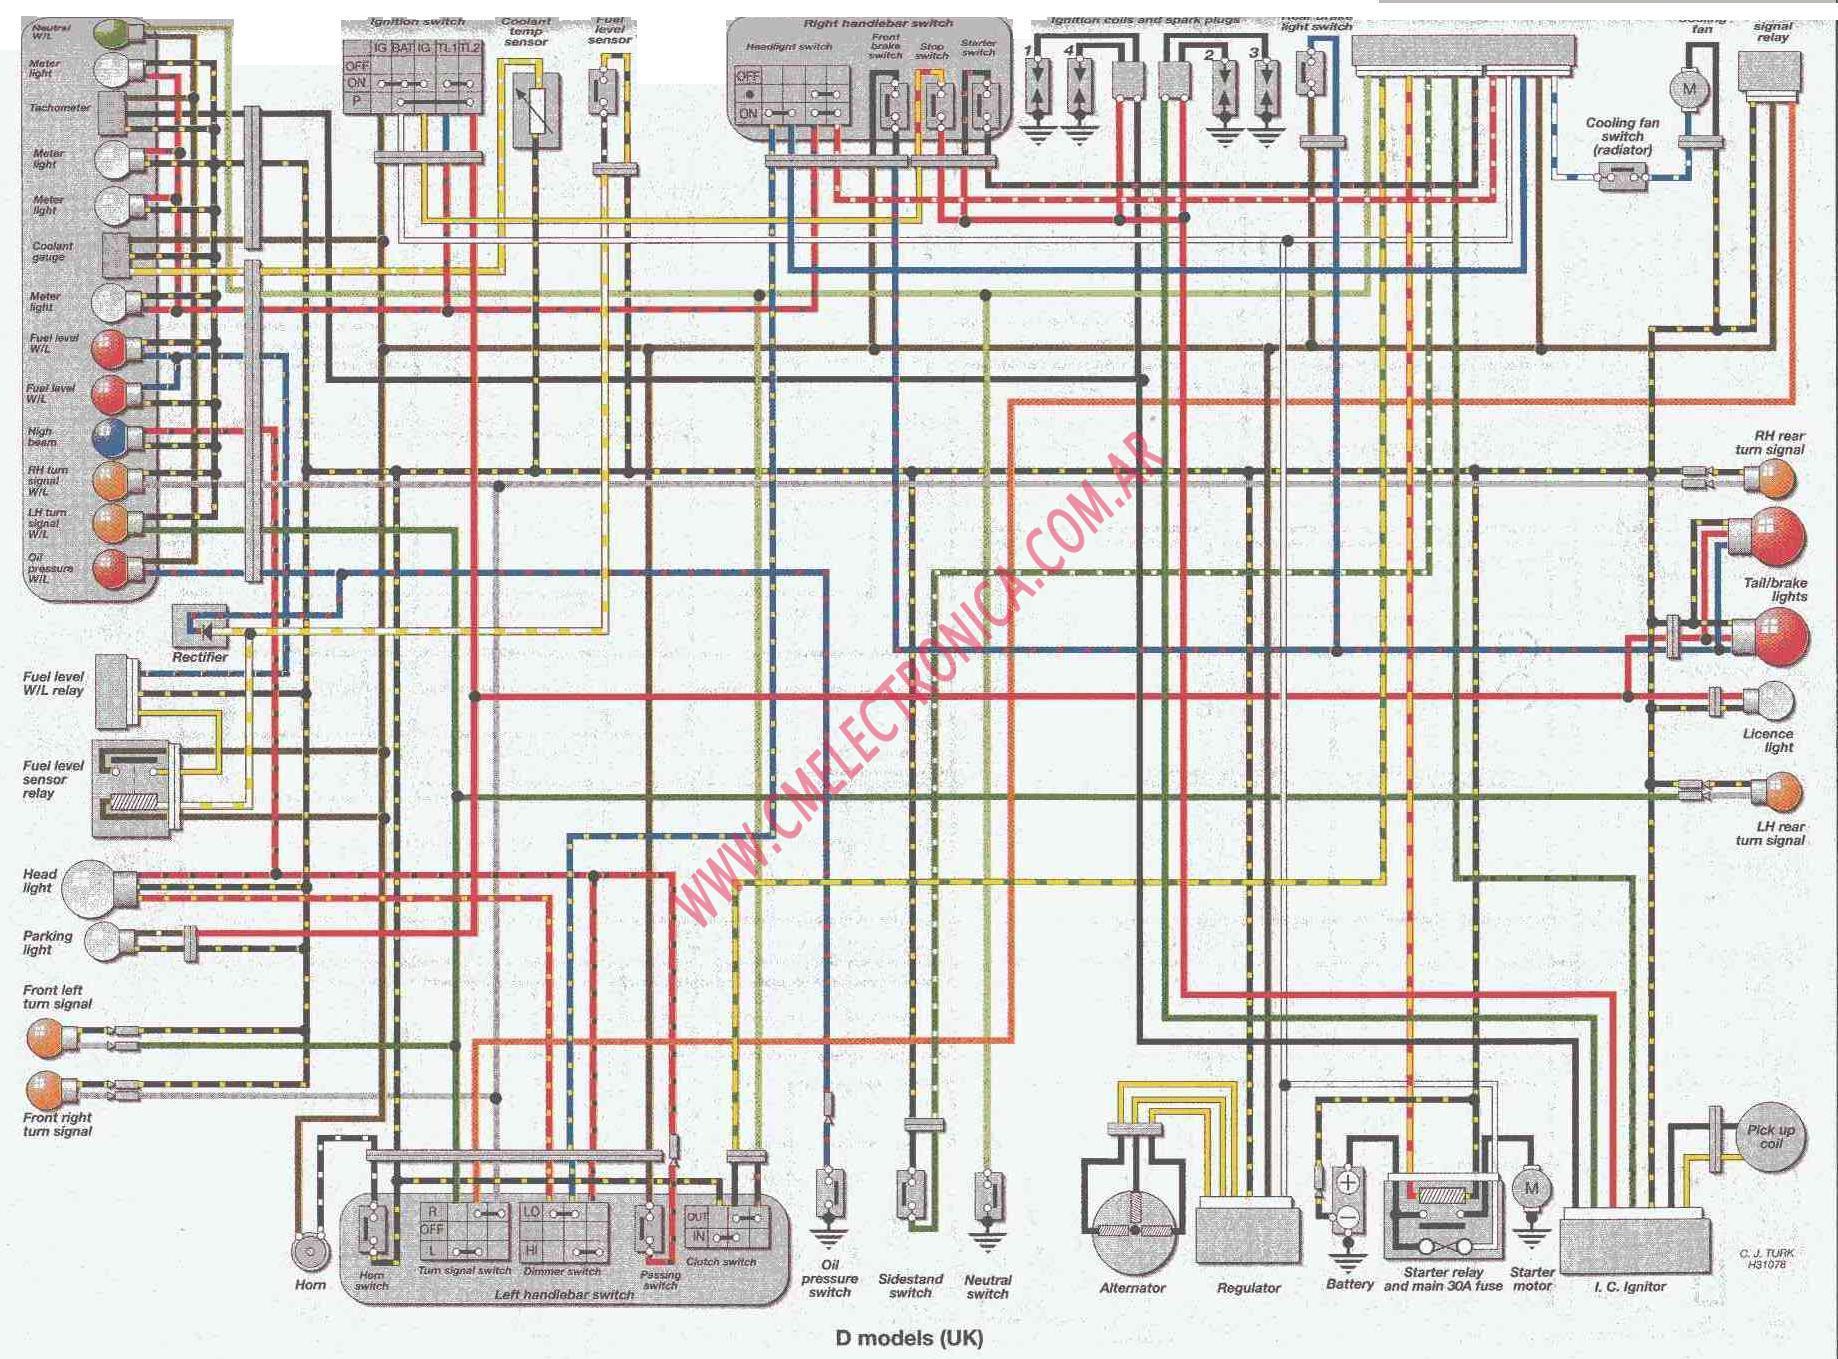 hight resolution of www cmelectronica com ar wiring diagram imagenes k rh 64 boptions1 de 2005 zx6r 636 rear wiring harness 2004 kawasaki zx6r wiring diagram